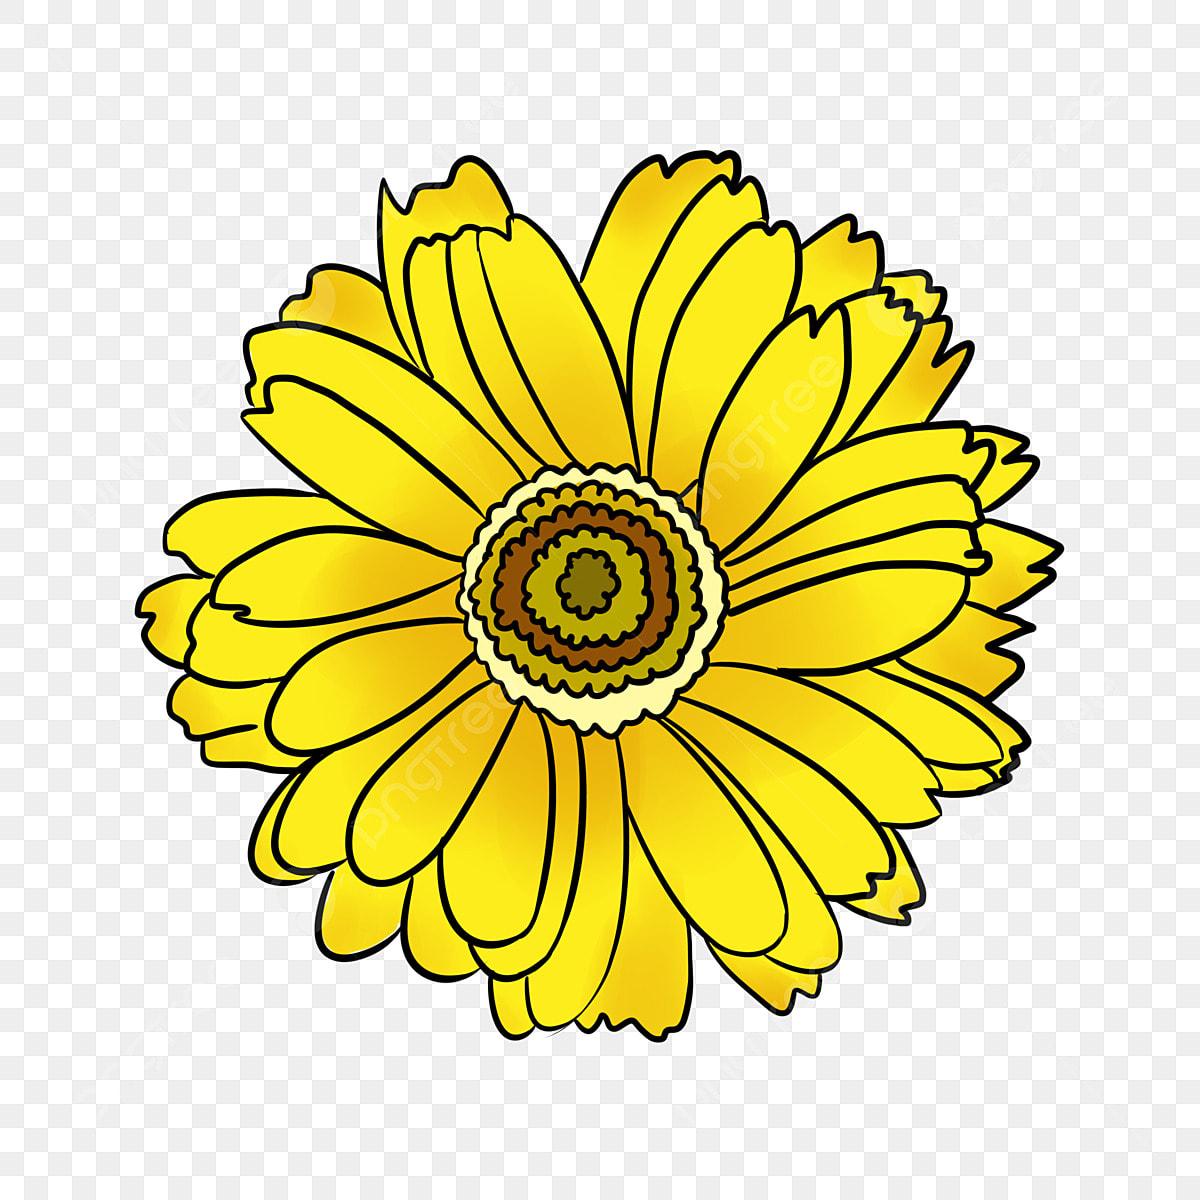 Bunga Matahari Kuning Yang Dilukis Dengan Tangan Bunga Matahari Bunga Matahari Lukisan Tangan Png Transparan Gambar Clipart Dan File Psd Untuk Unduh Gratis